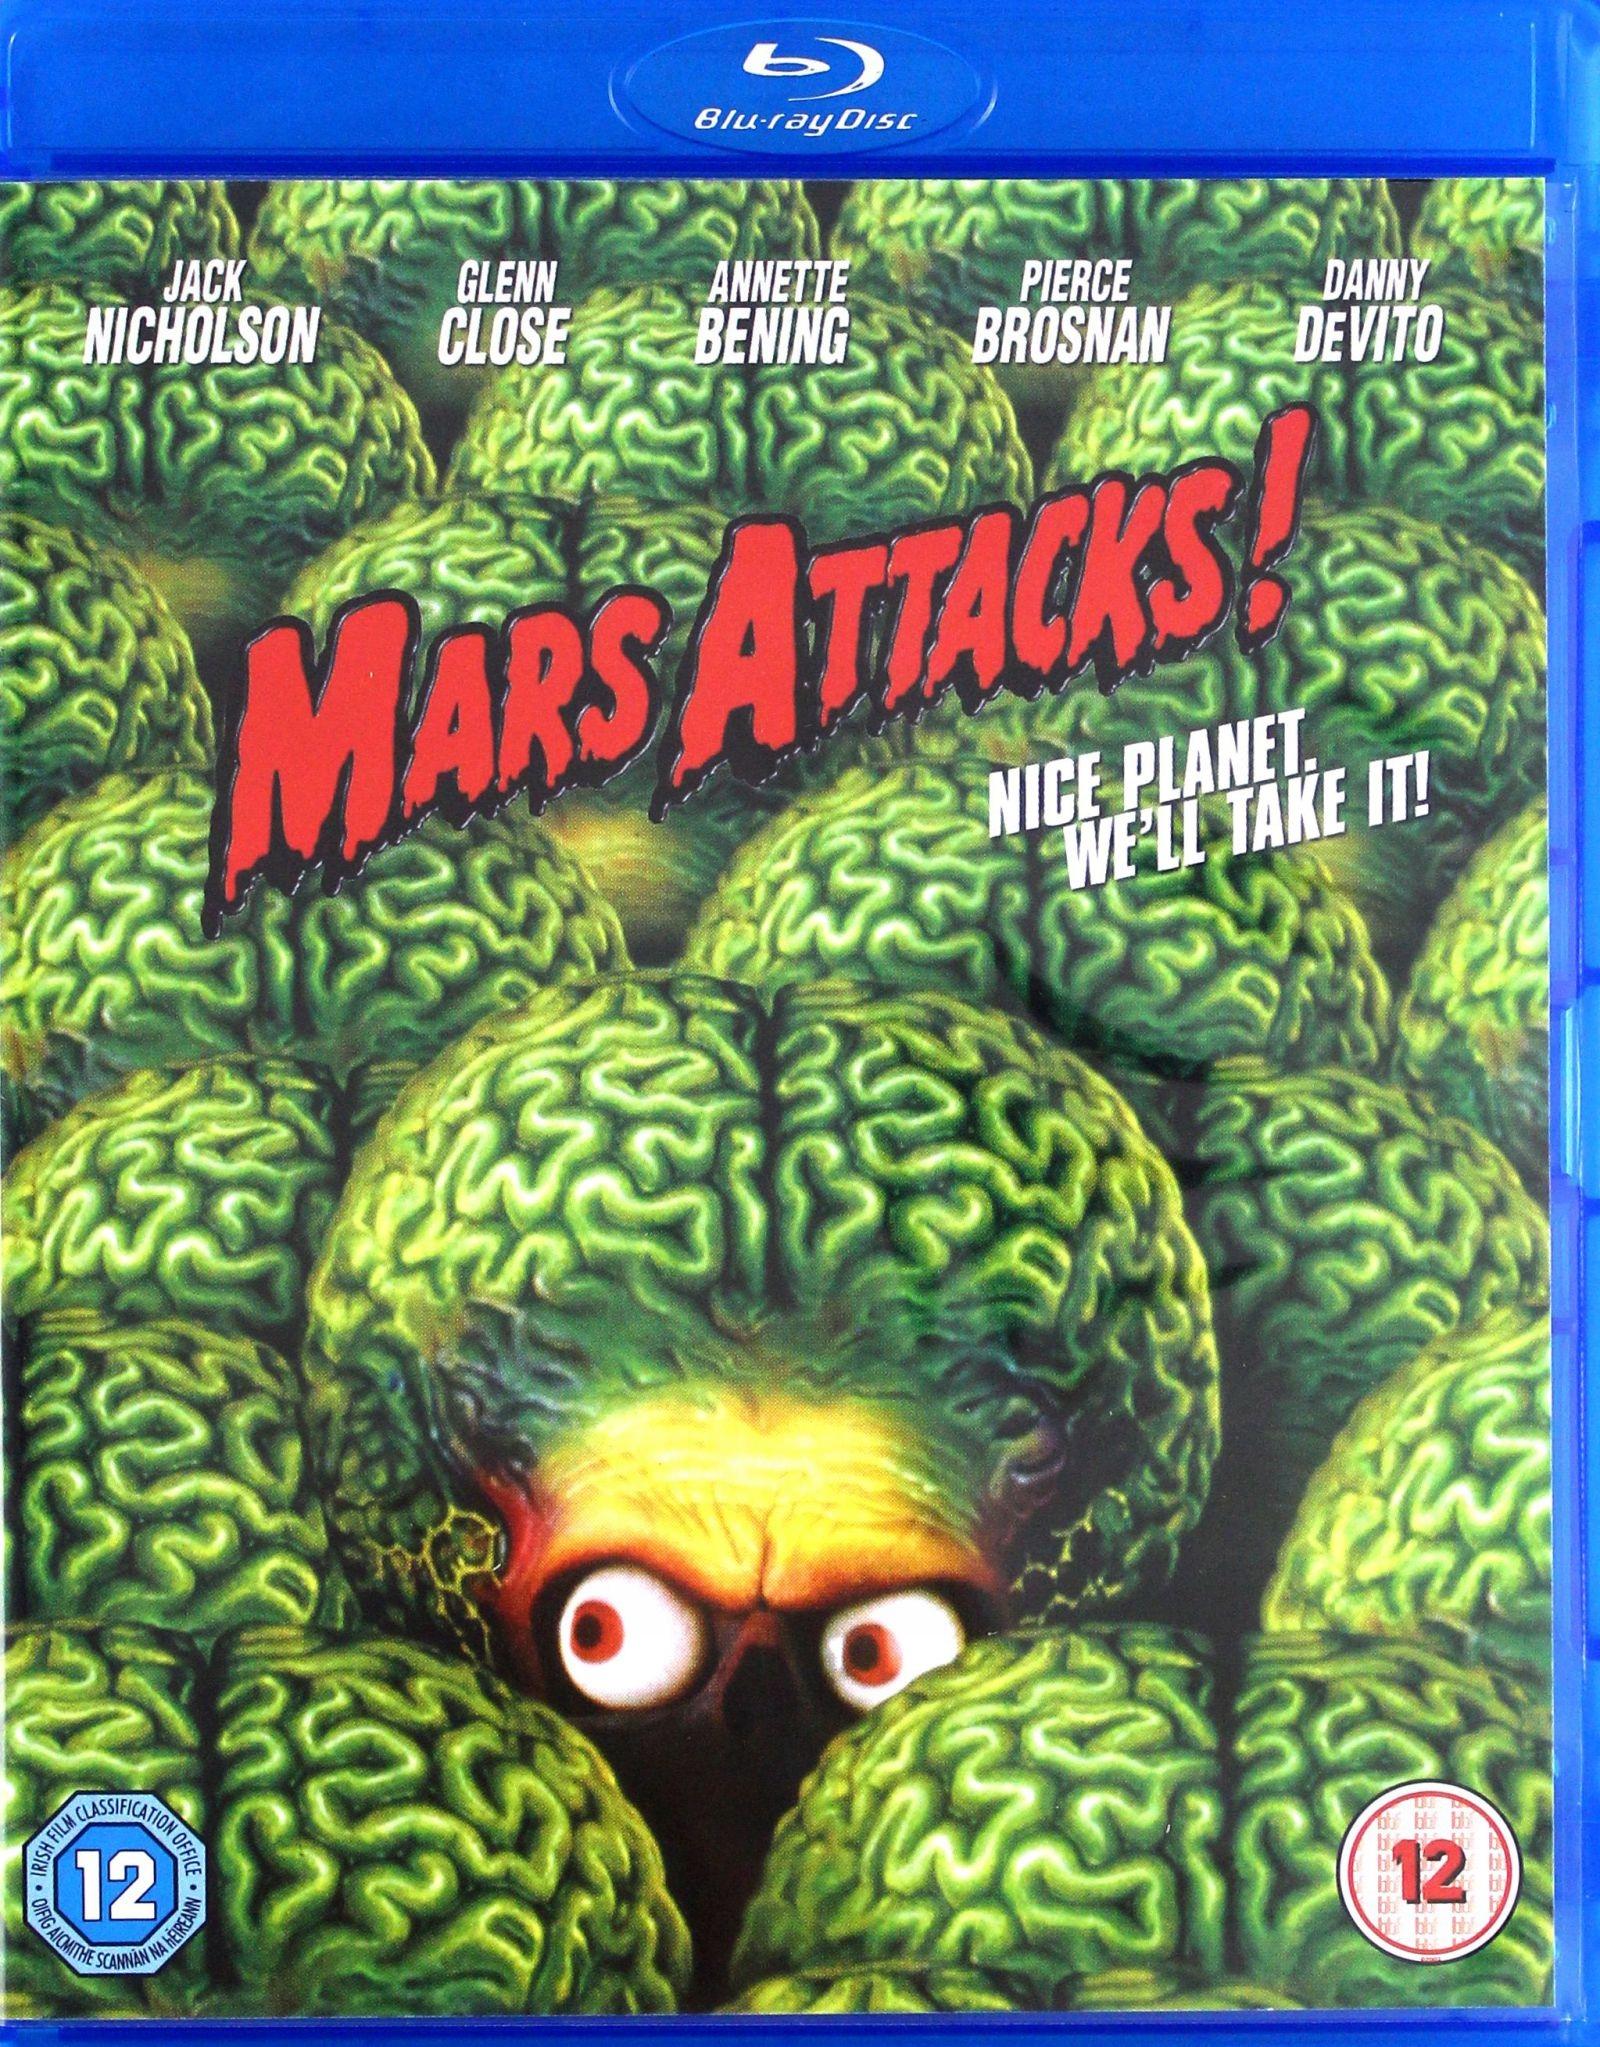 MARS ATTACKS [BLU-RAY]